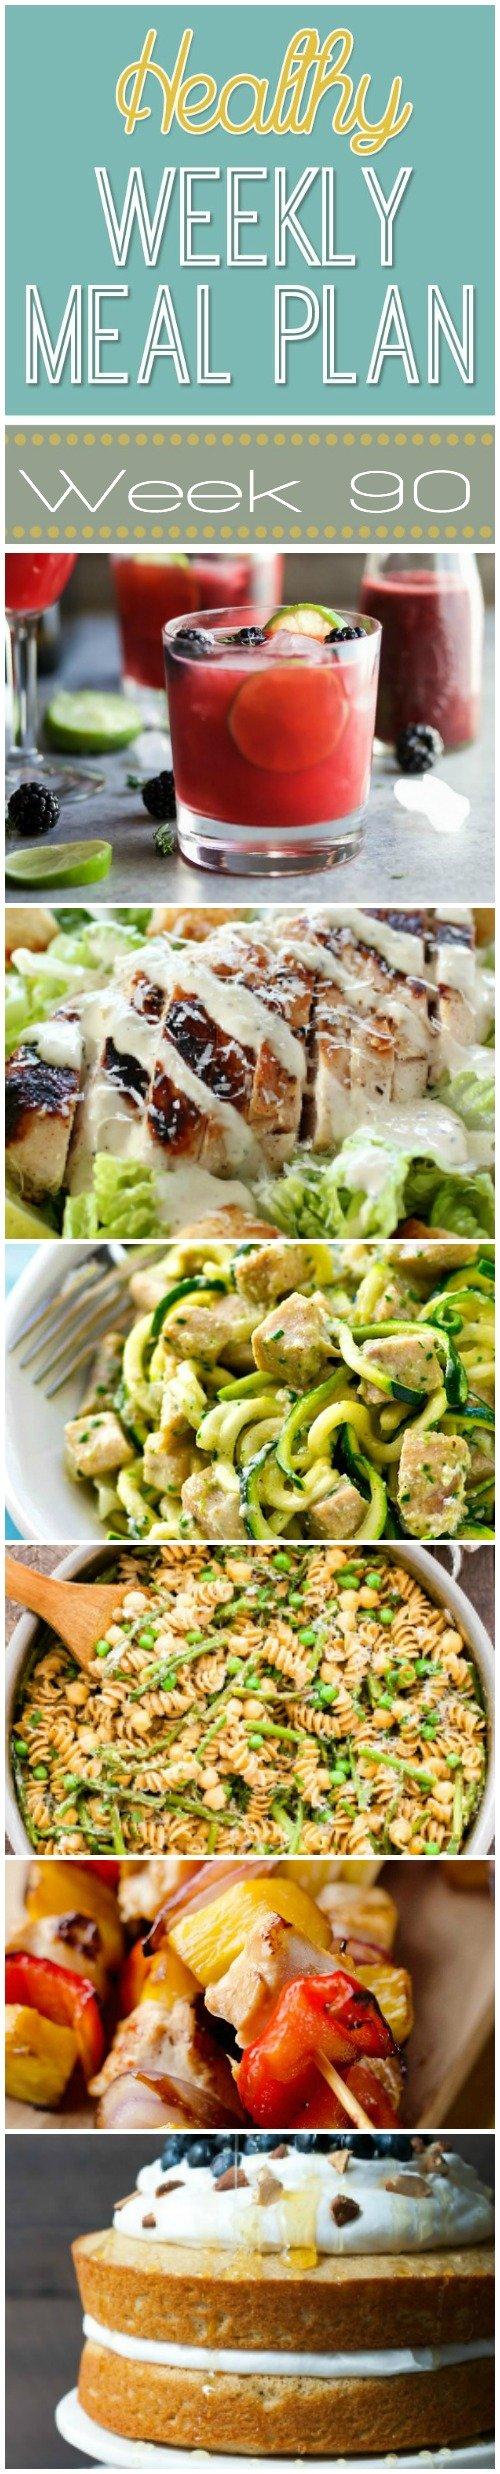 Healthy Weekly Meal Plan #90